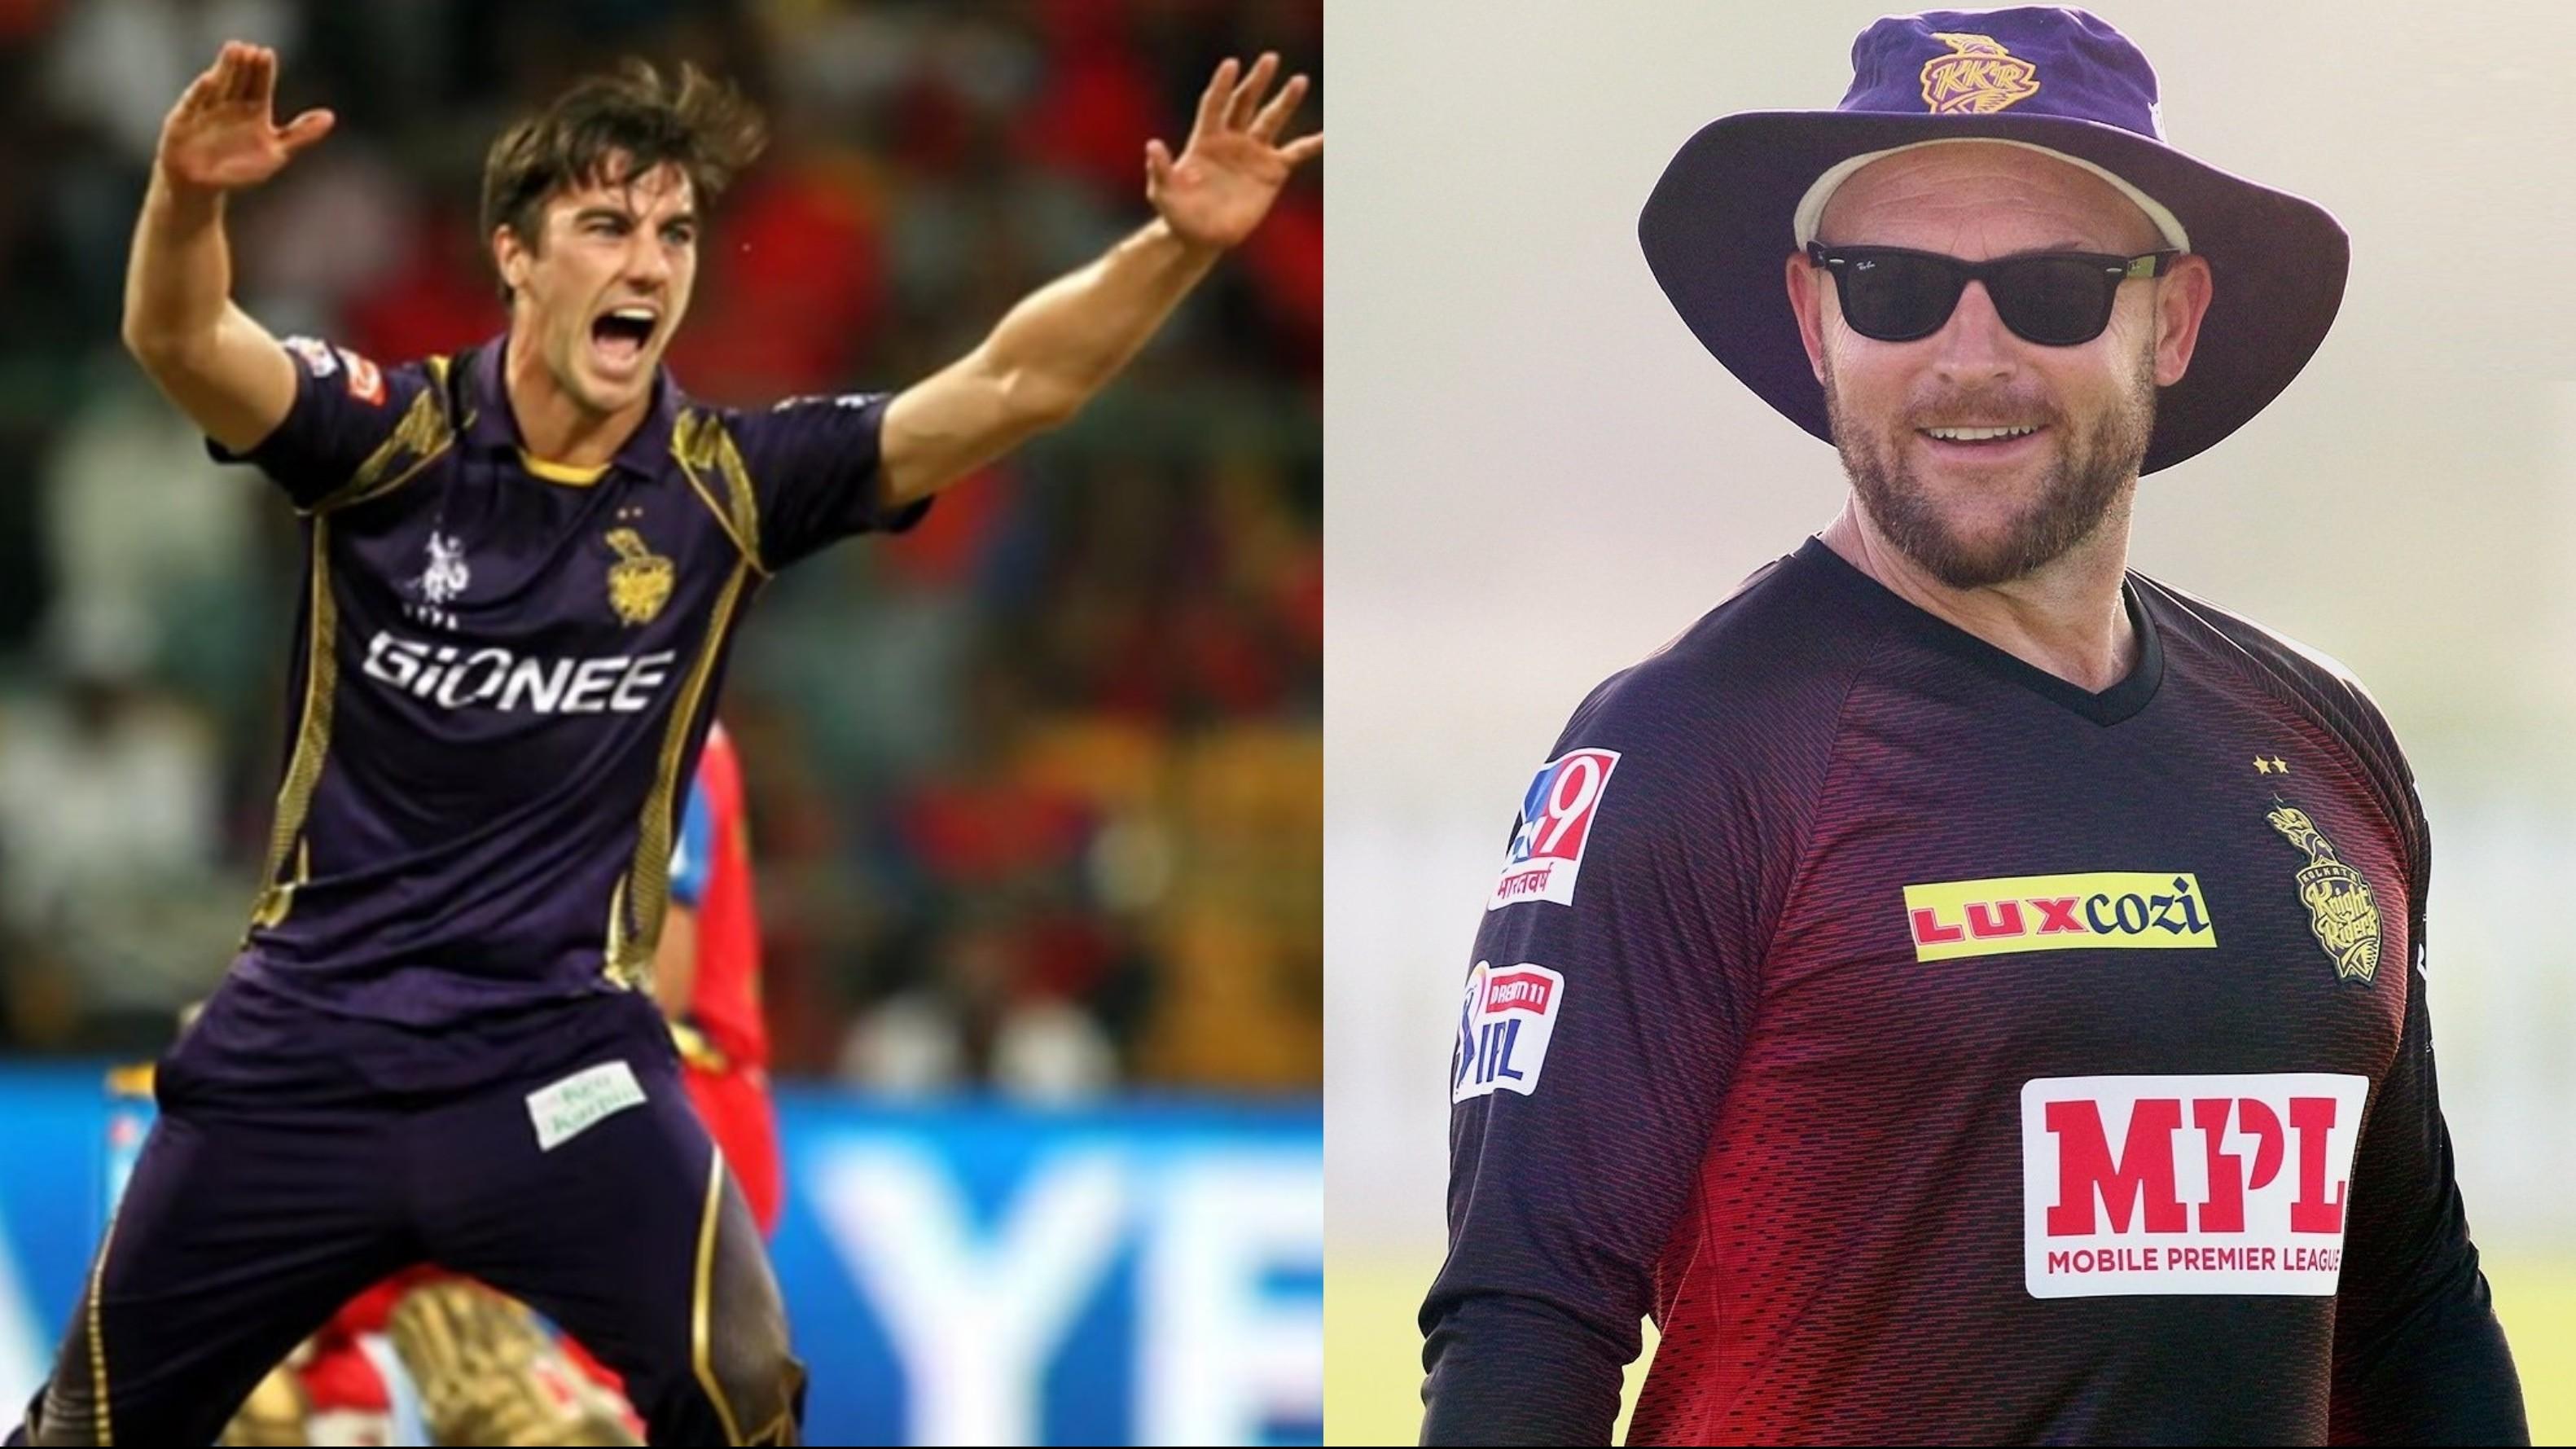 IPL 2020: KKR head coach Brendon McCullum hails Pat Cummins as a key overseas bowler